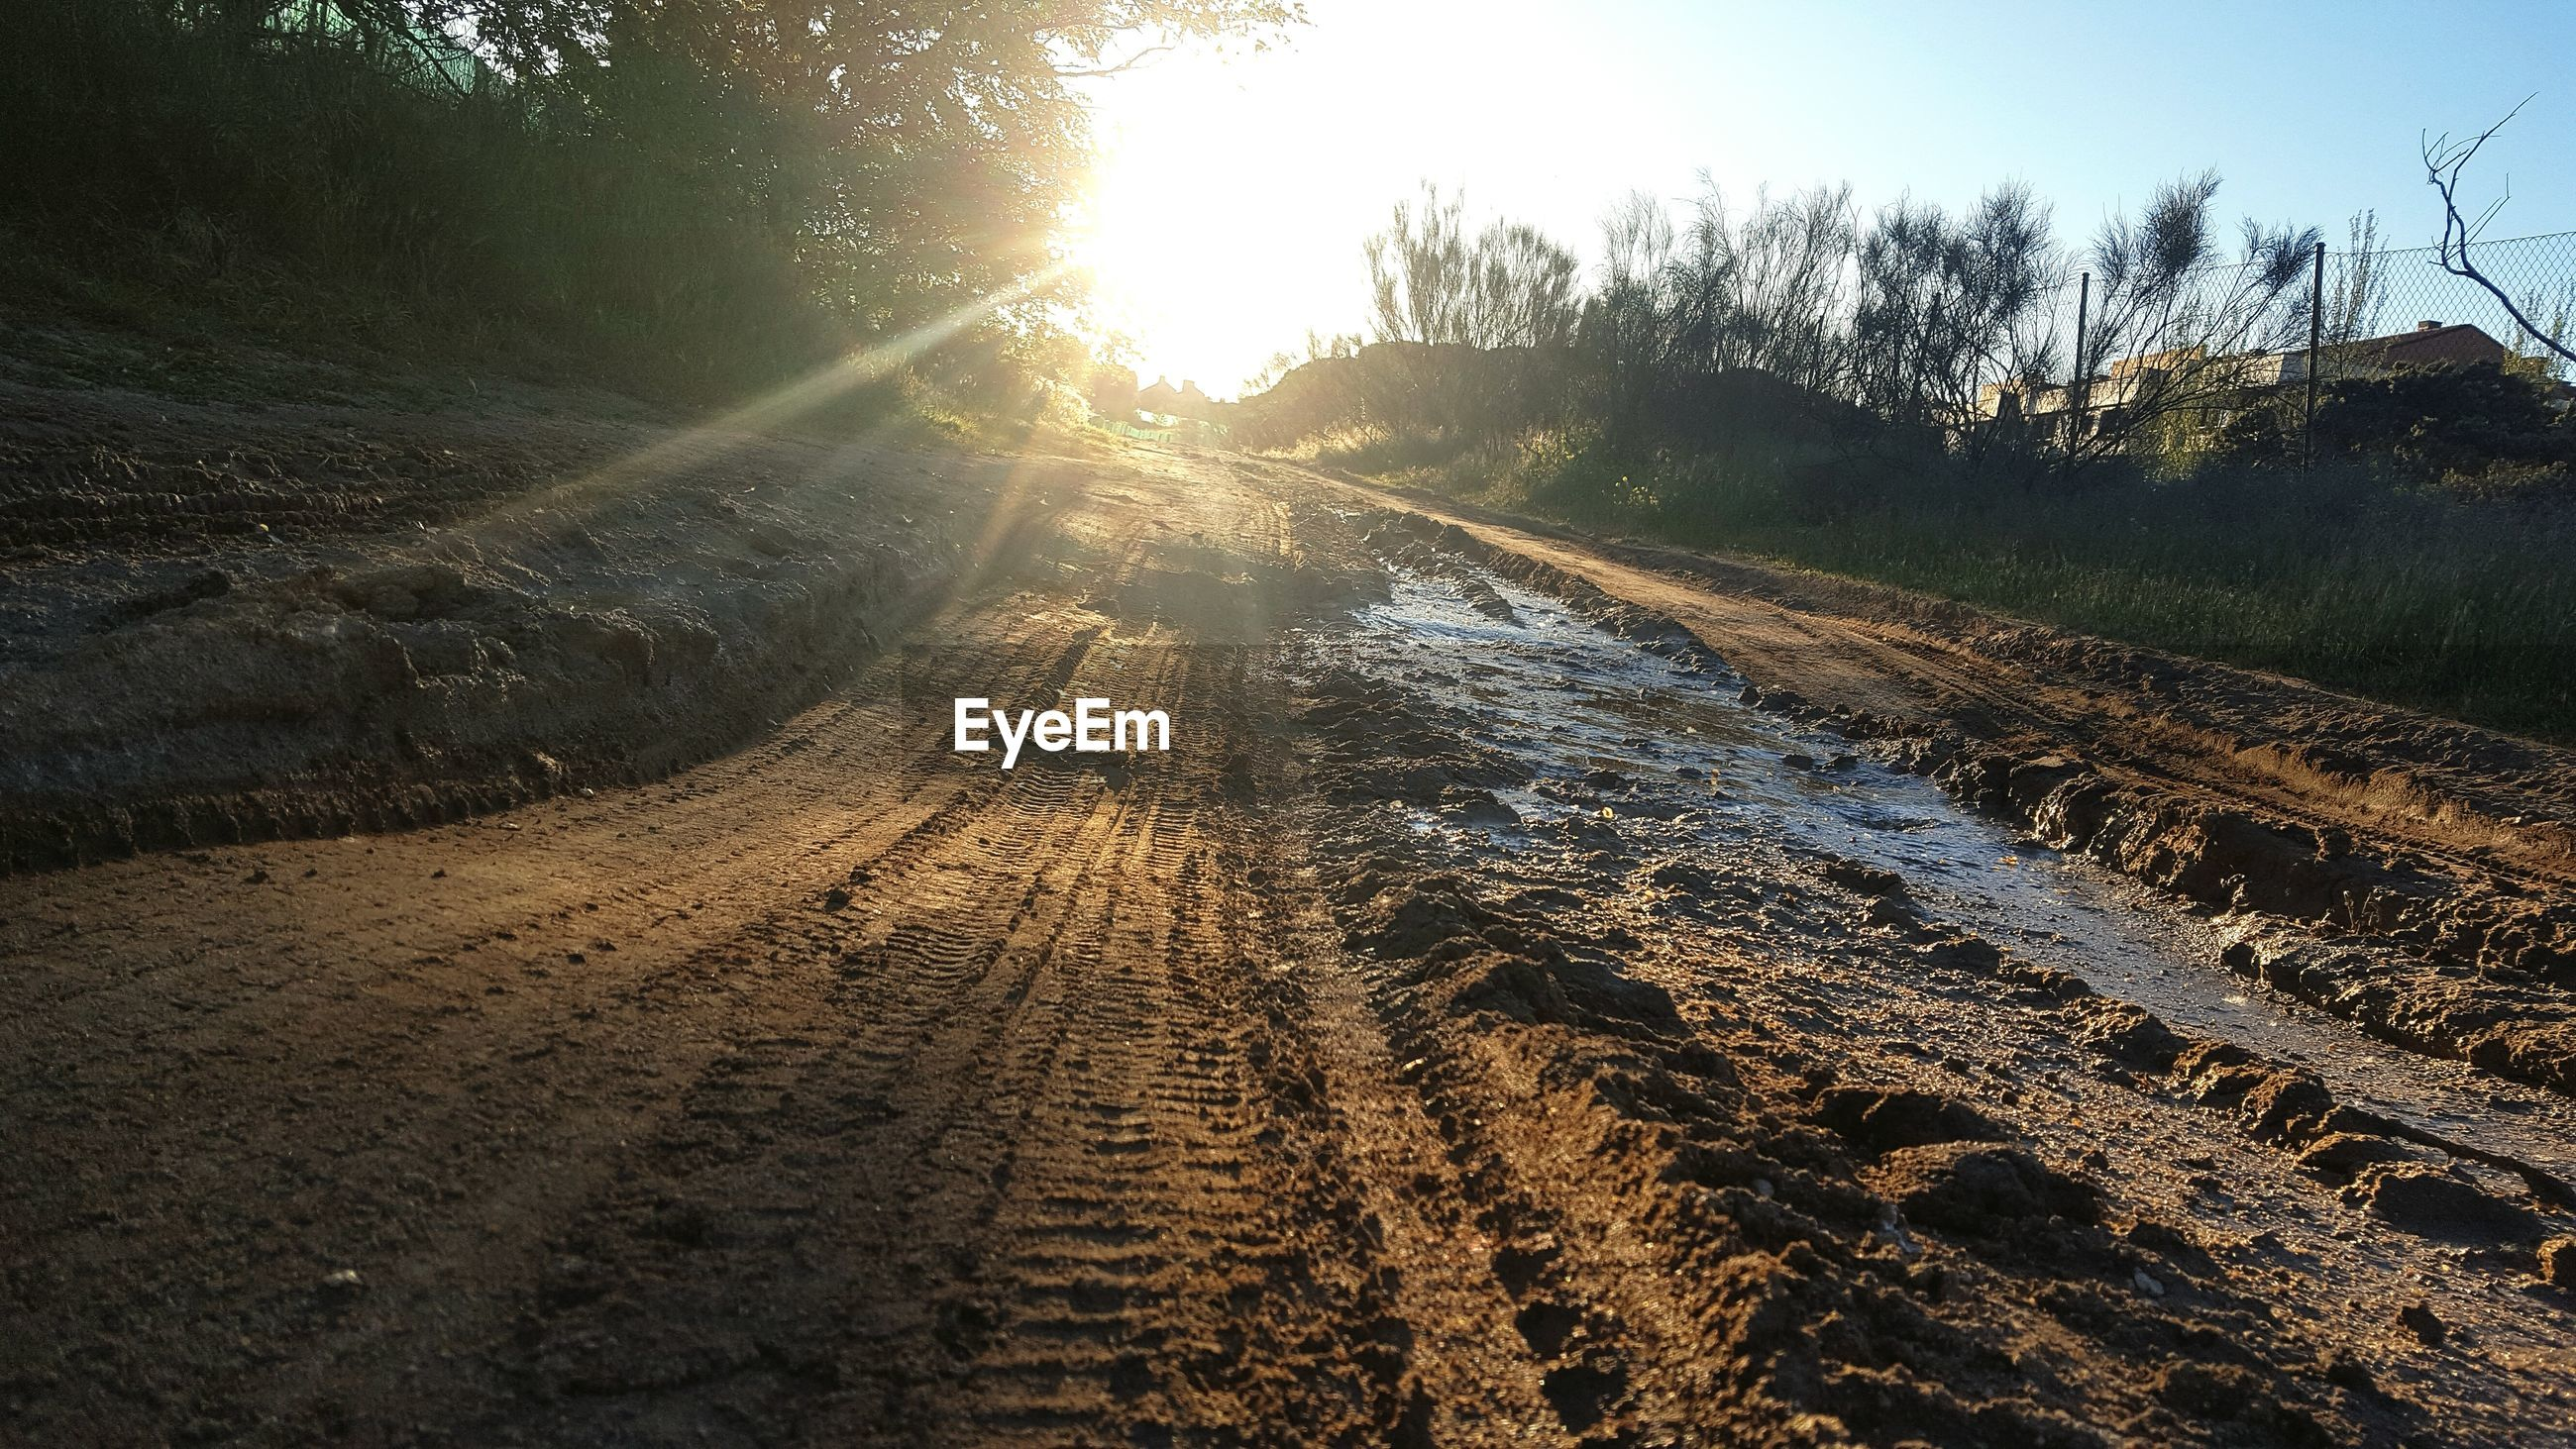 Surface level of dirt road along landscape